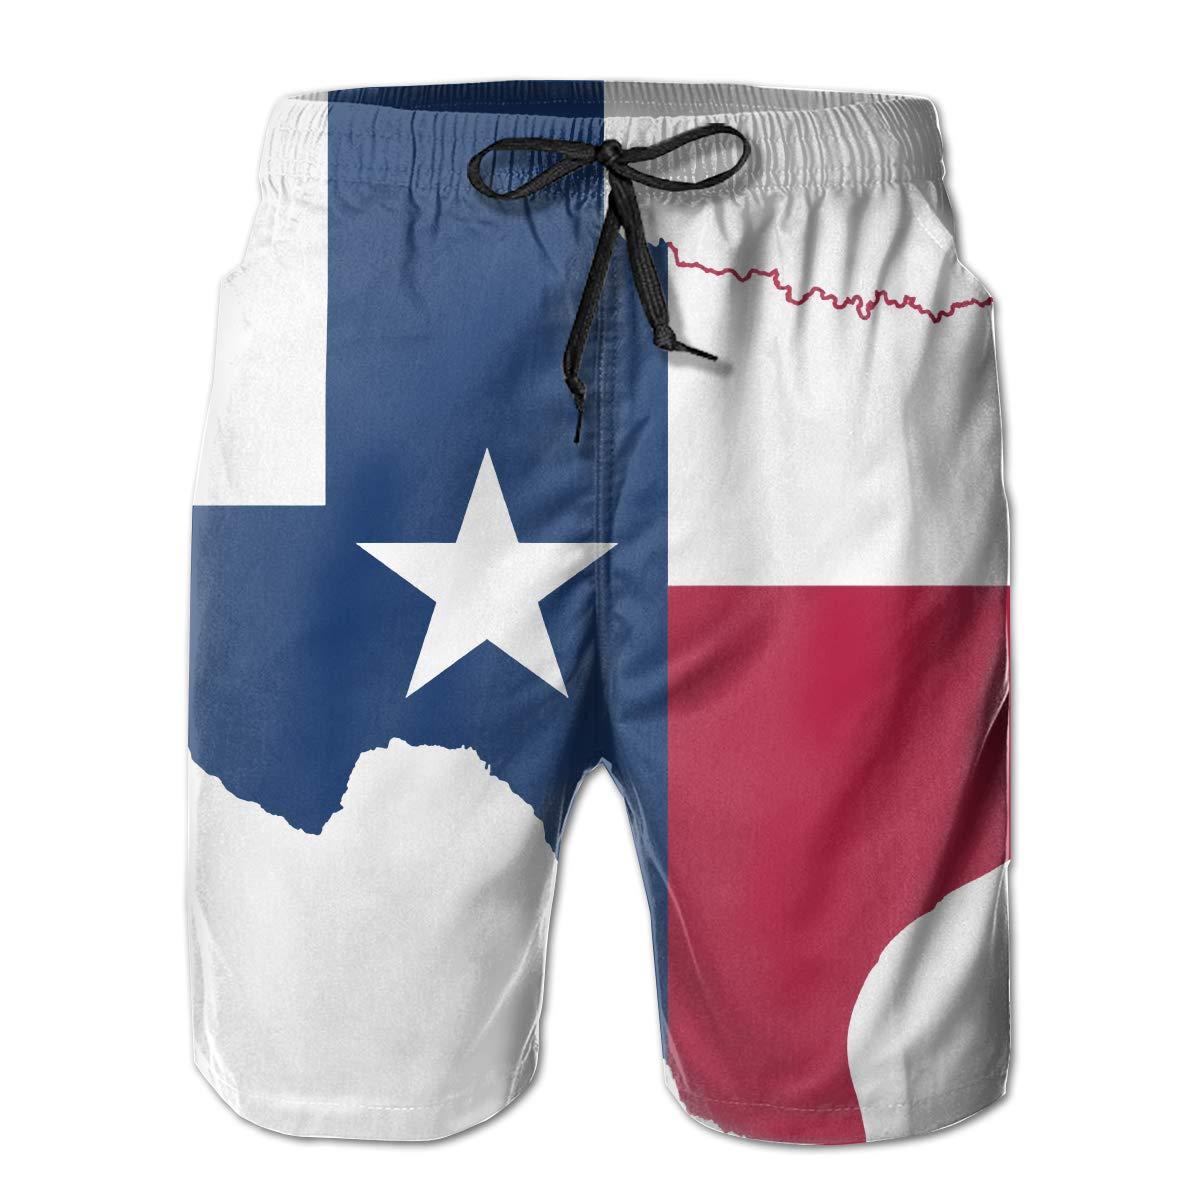 Zzfsxt Texas Flag Mens 3D Print Graphic Quick Dry Summer Boardshort Beach Short